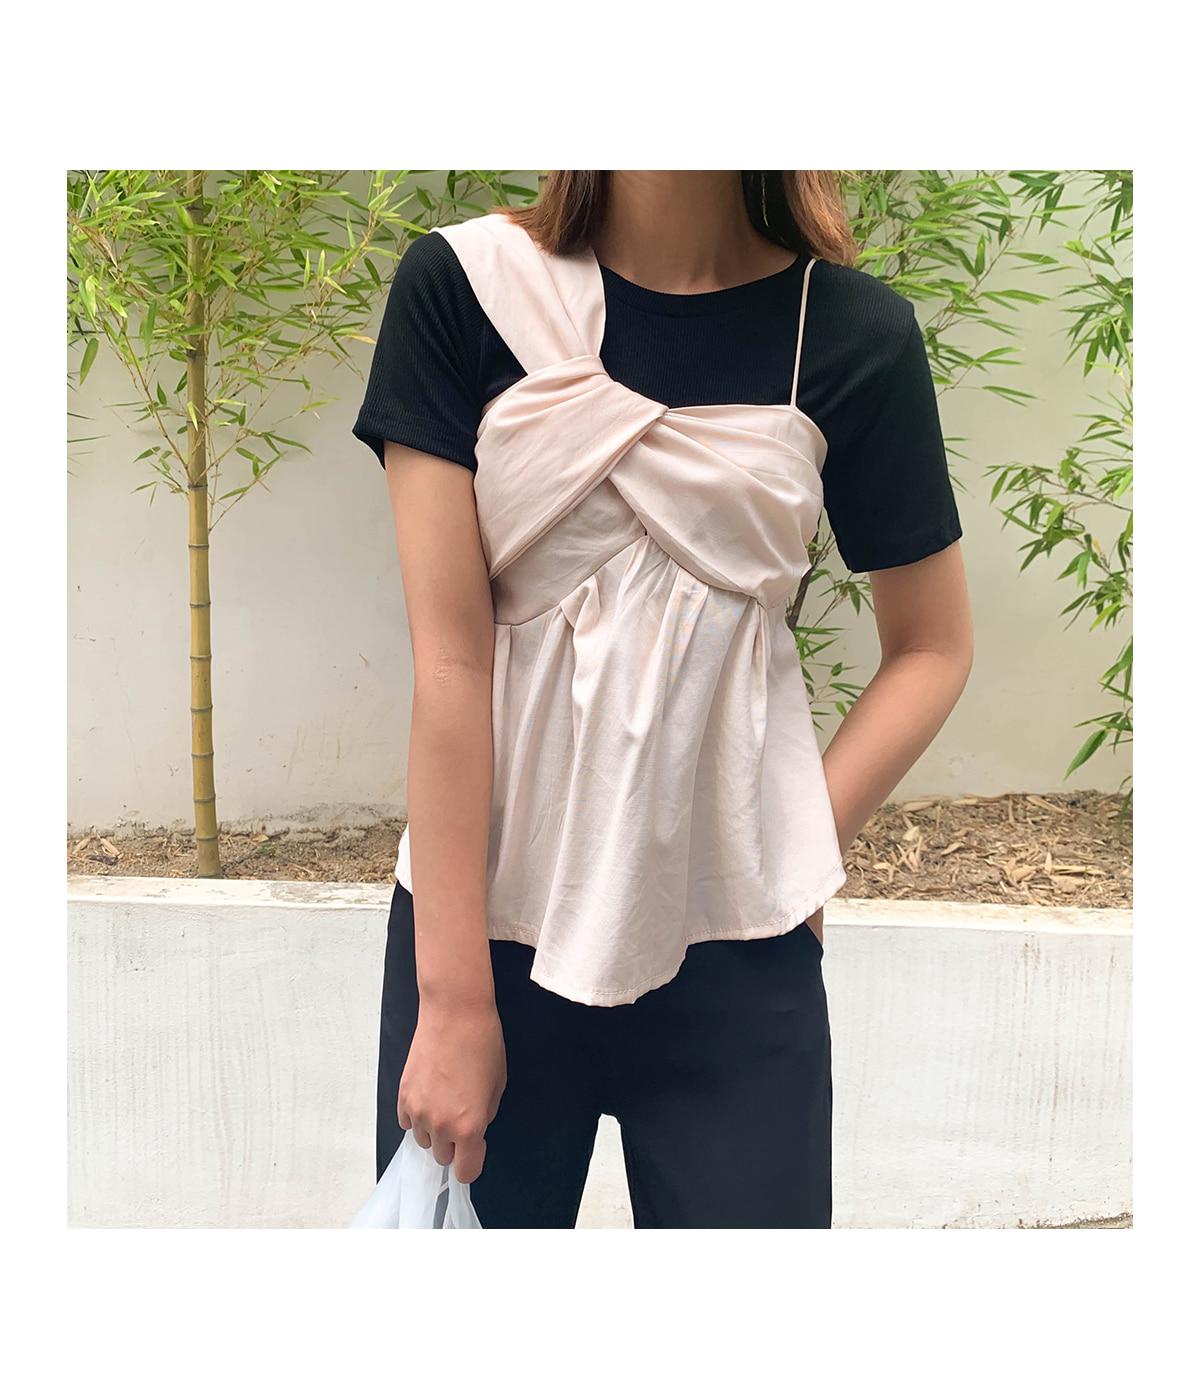 Unbalmies blouse